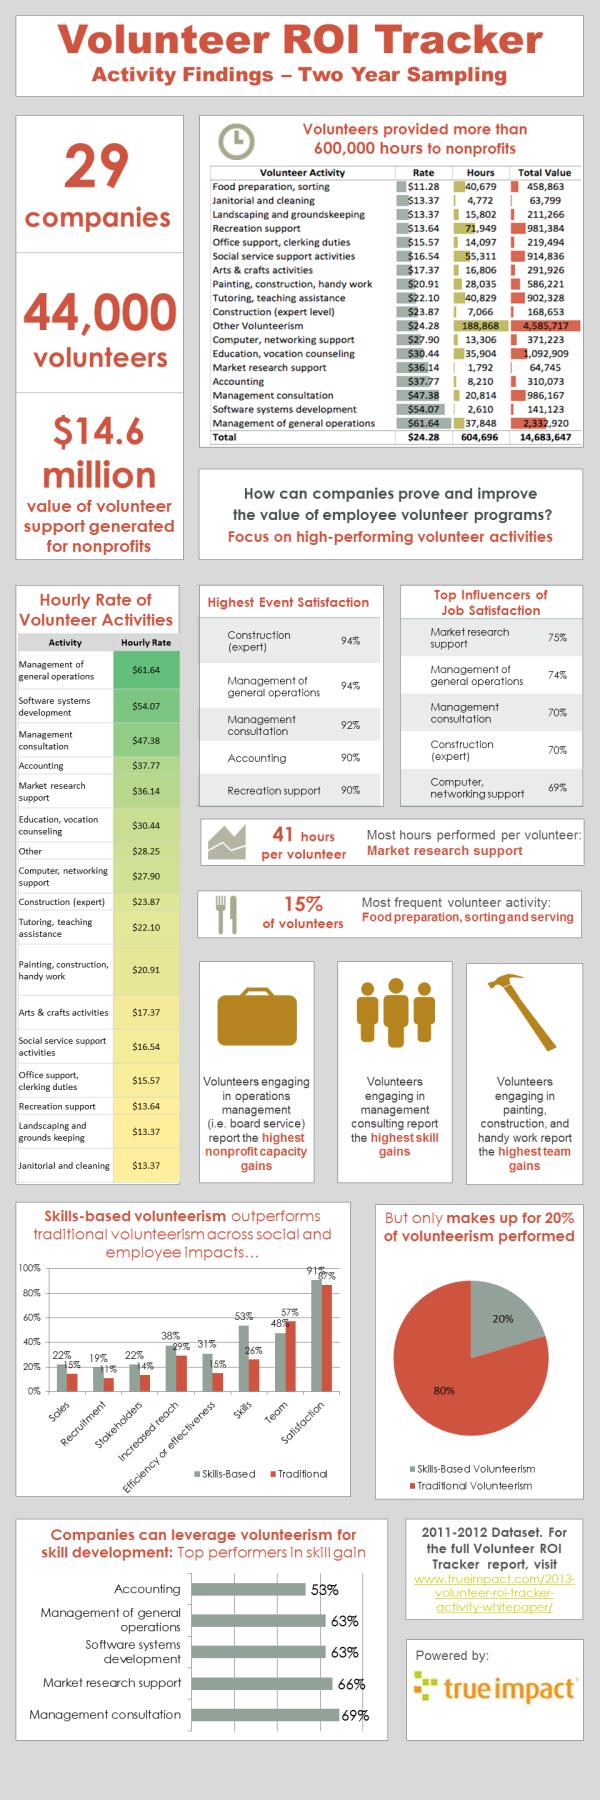 Volunteer ROI Tracker Findings Graphic resized 600